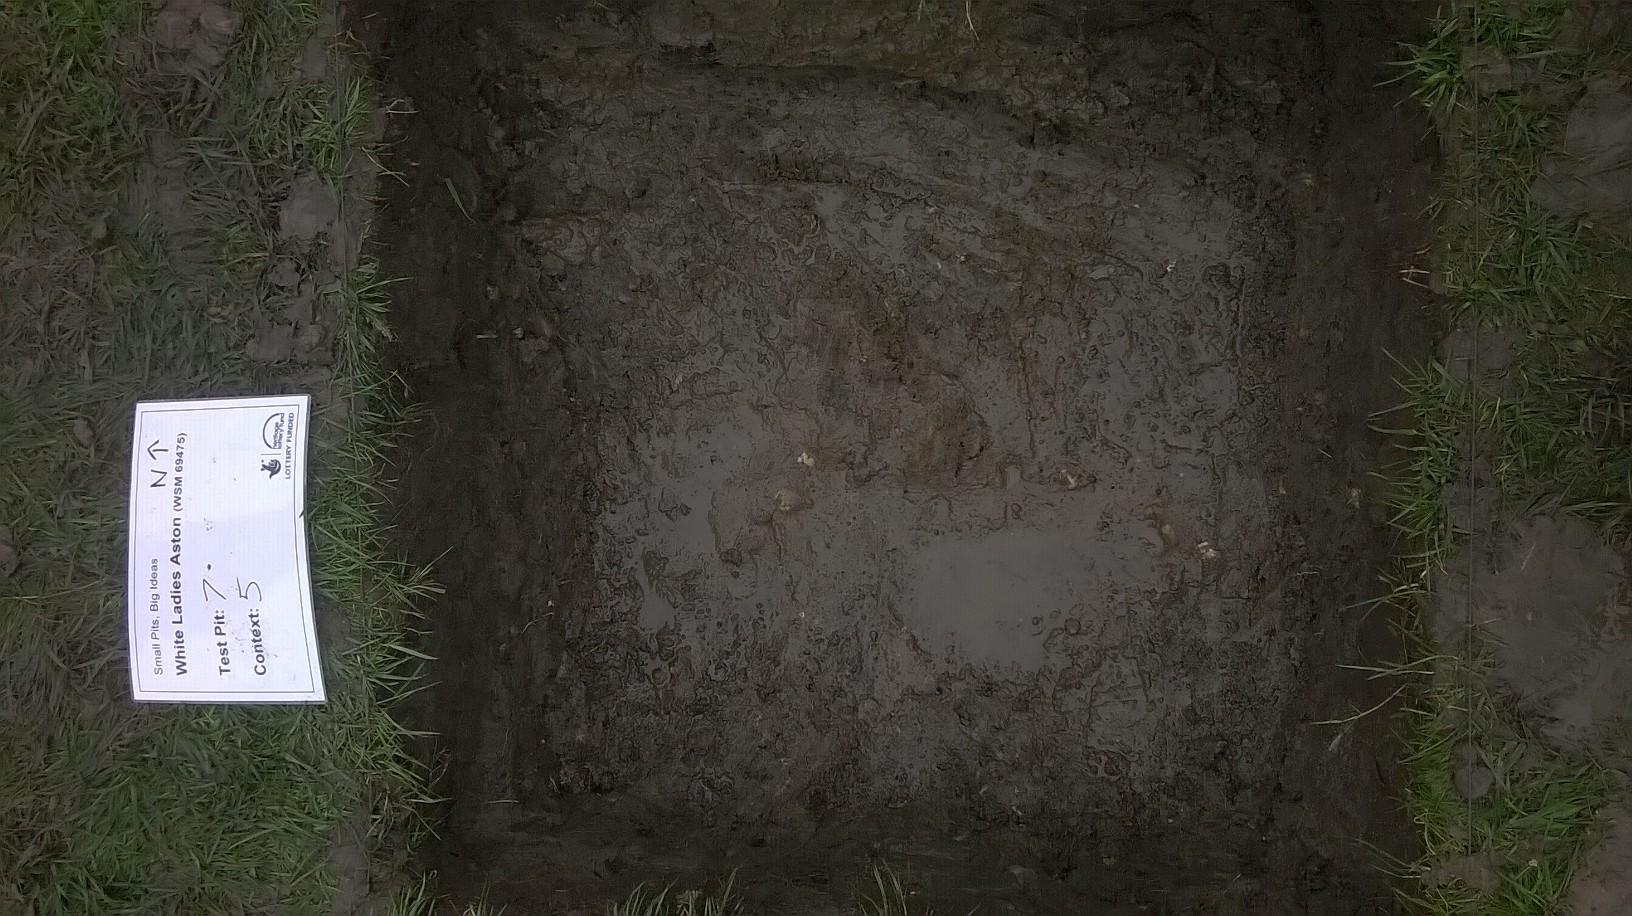 test pit dug